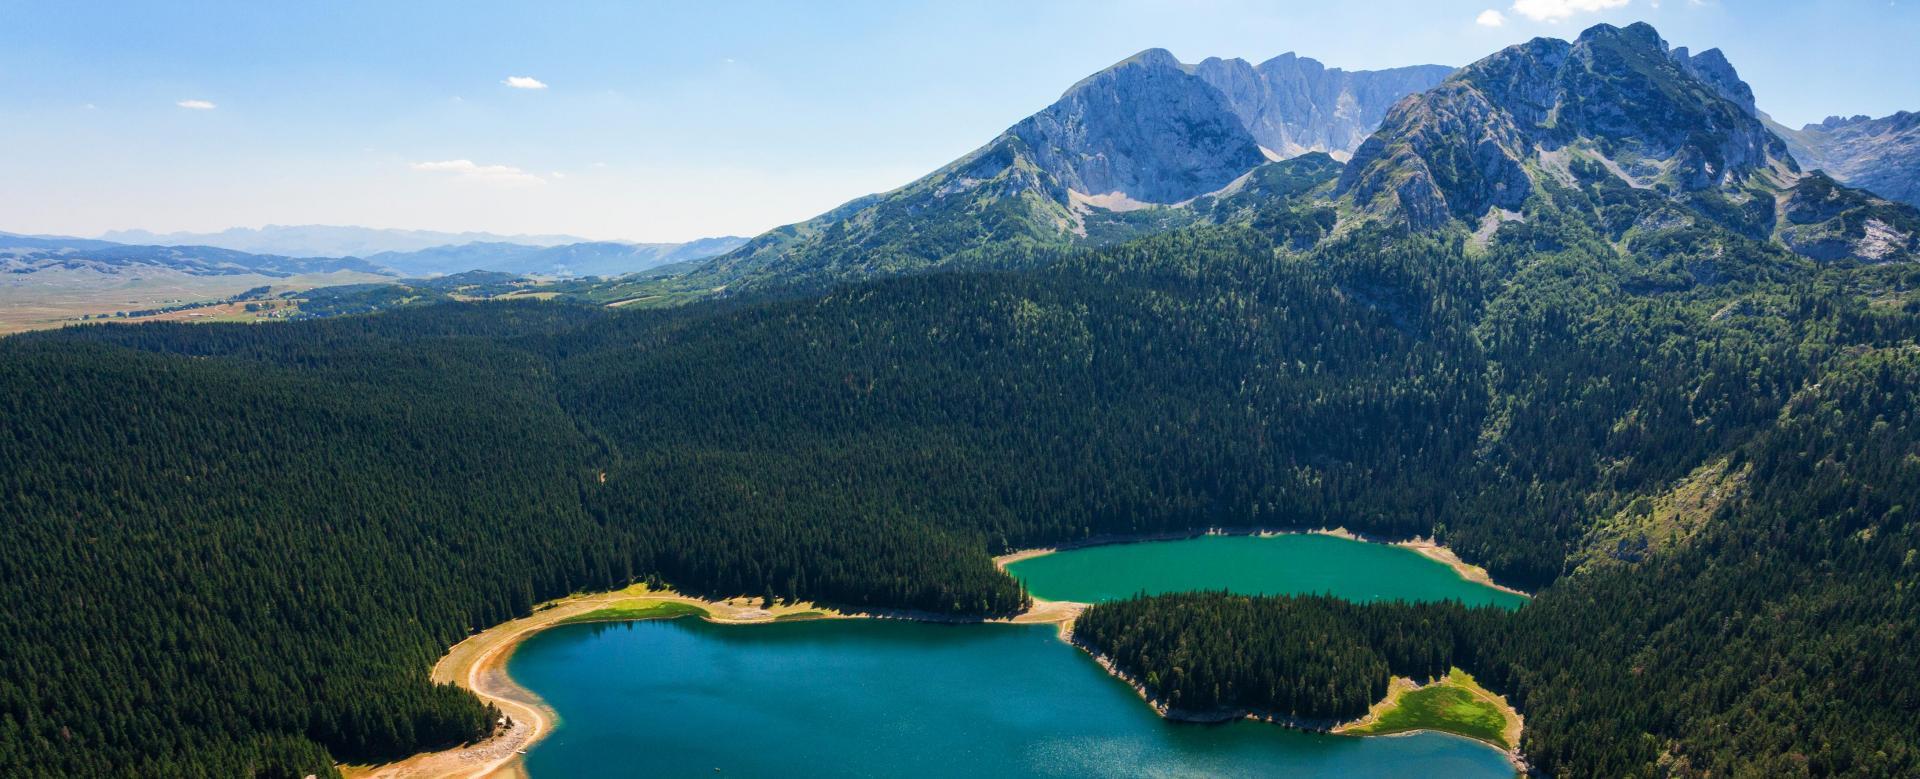 Voyage à pied Bosnie-Herzégovine : Via dinarica : de la bosnie au monténégro